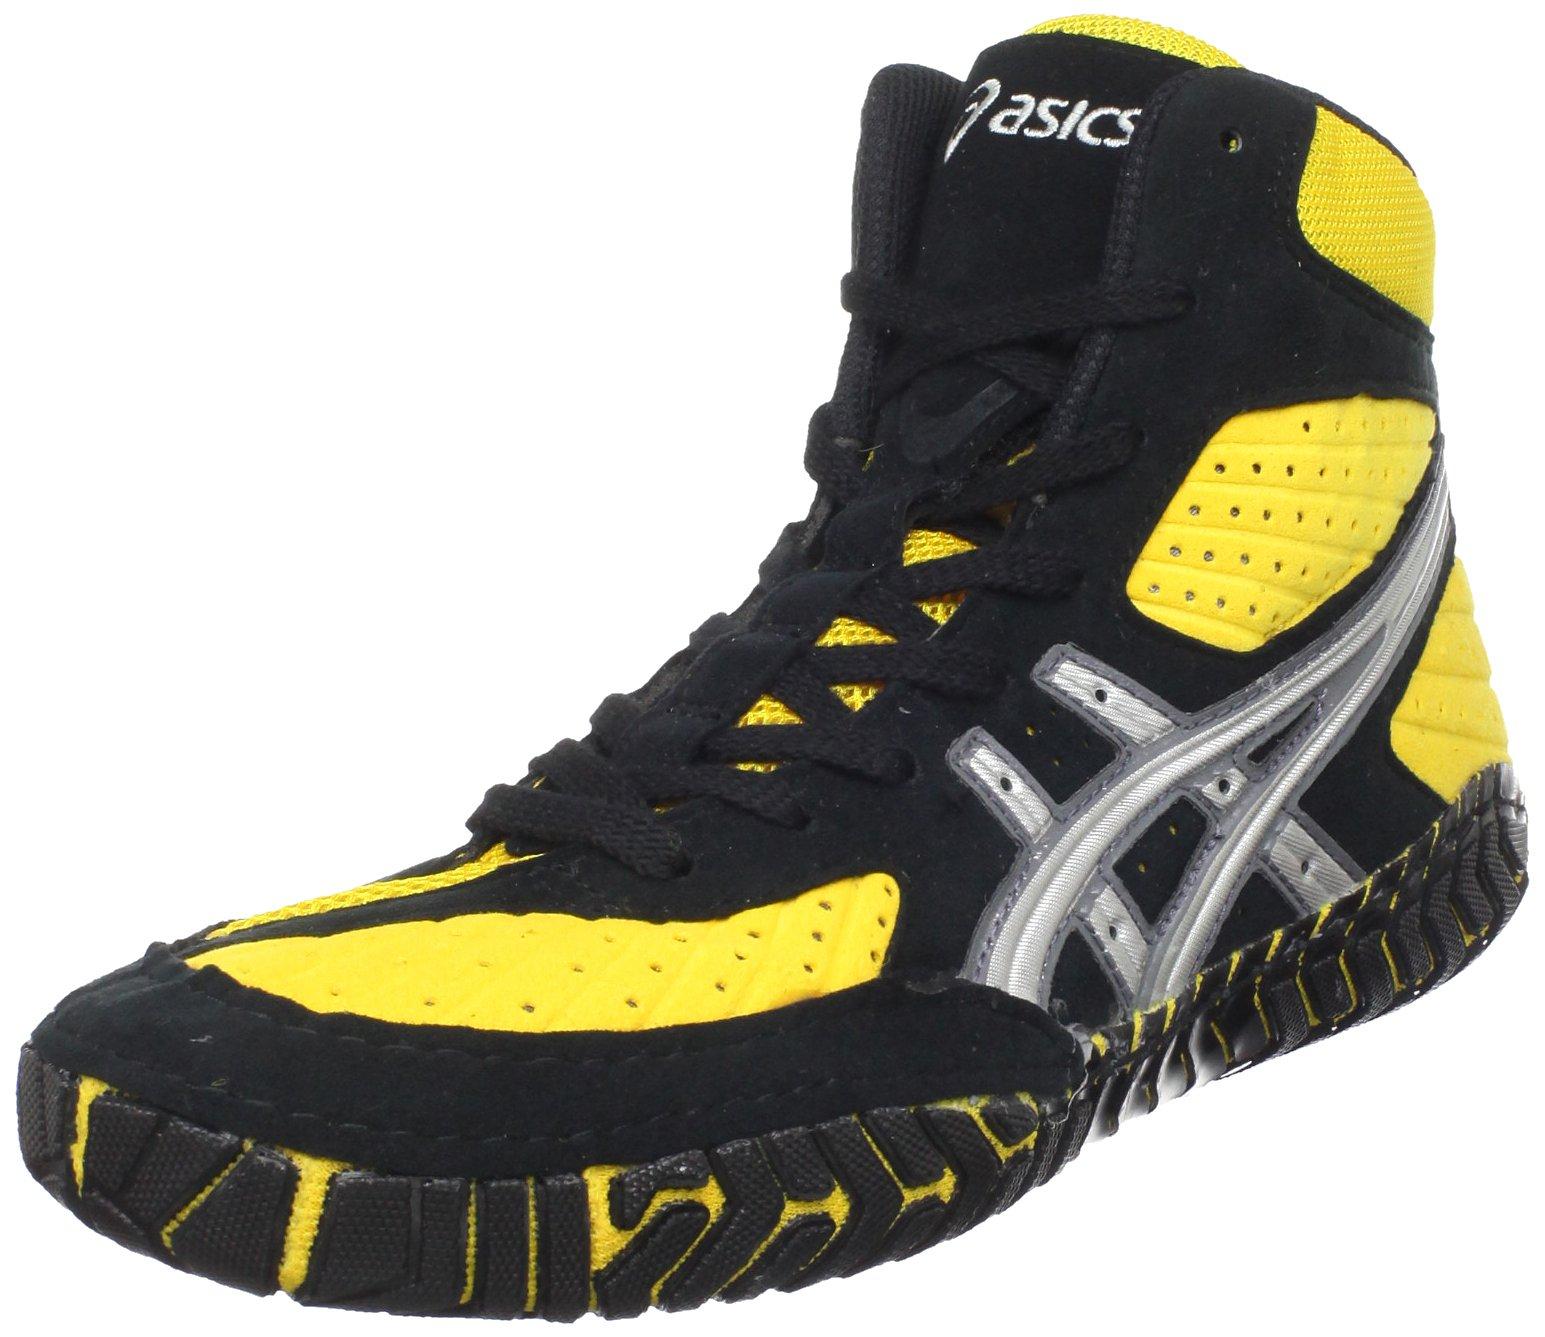 ASICS Men's Aggressor Wrestling Shoe,Yellow/Silver/Black,11.5 M US